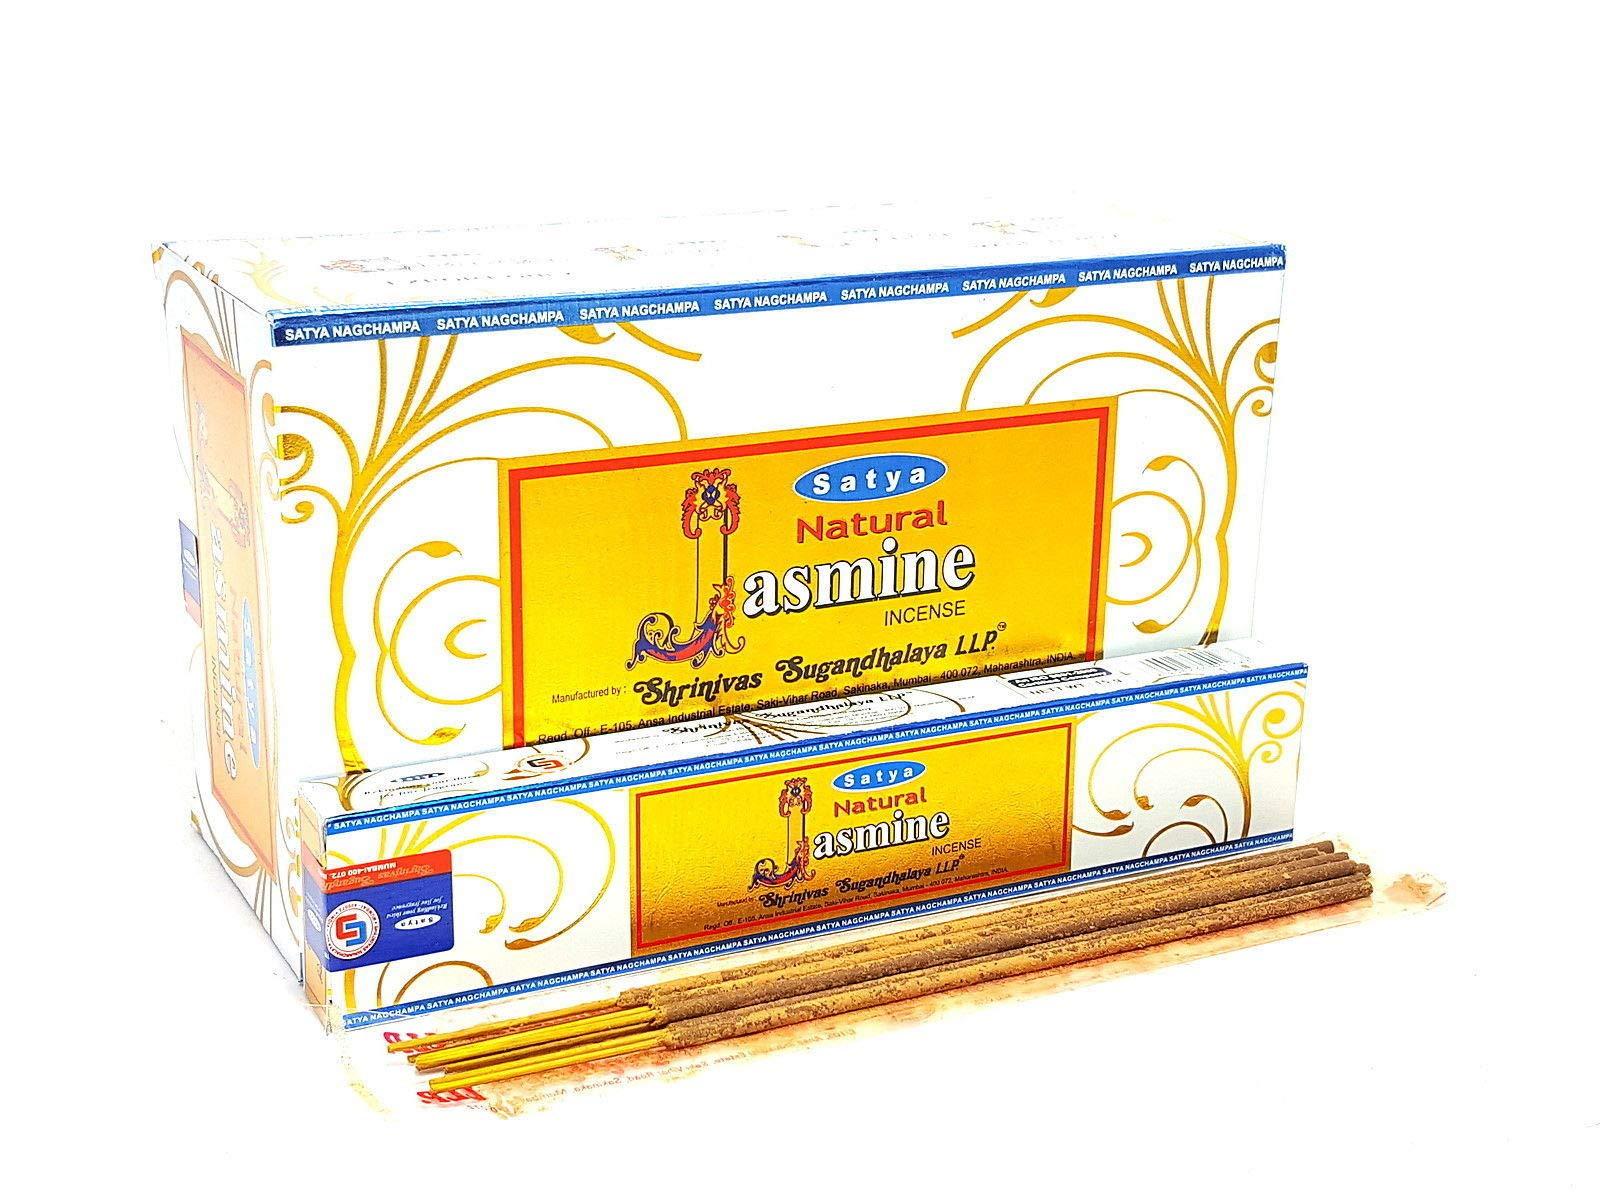 Satya Natural Jasmine Incense Sticks/Agarbatti   15 Grams x 12 Packs   Box of 180 Grams   Export Quality by Satya Sai Baba